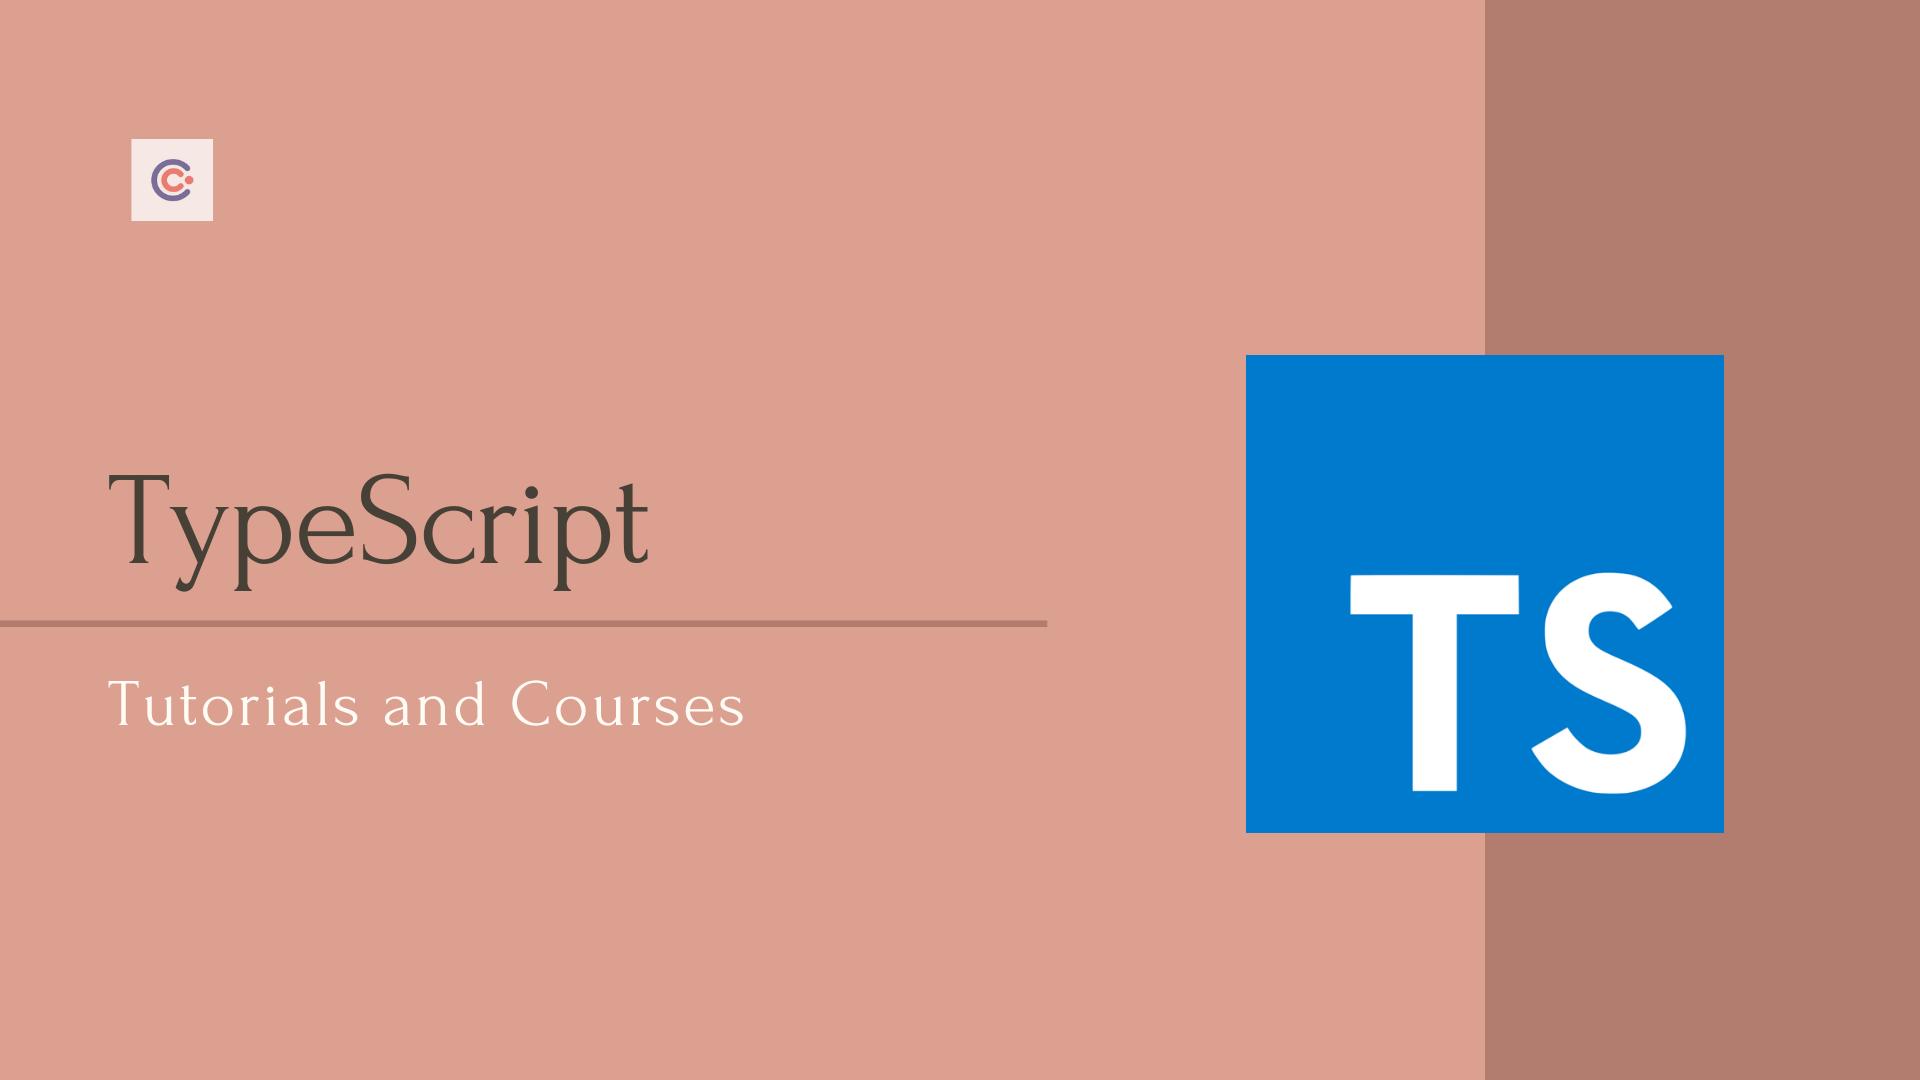 10 Best TypeScript Tutorials & Courses - Learn TypeScript Online